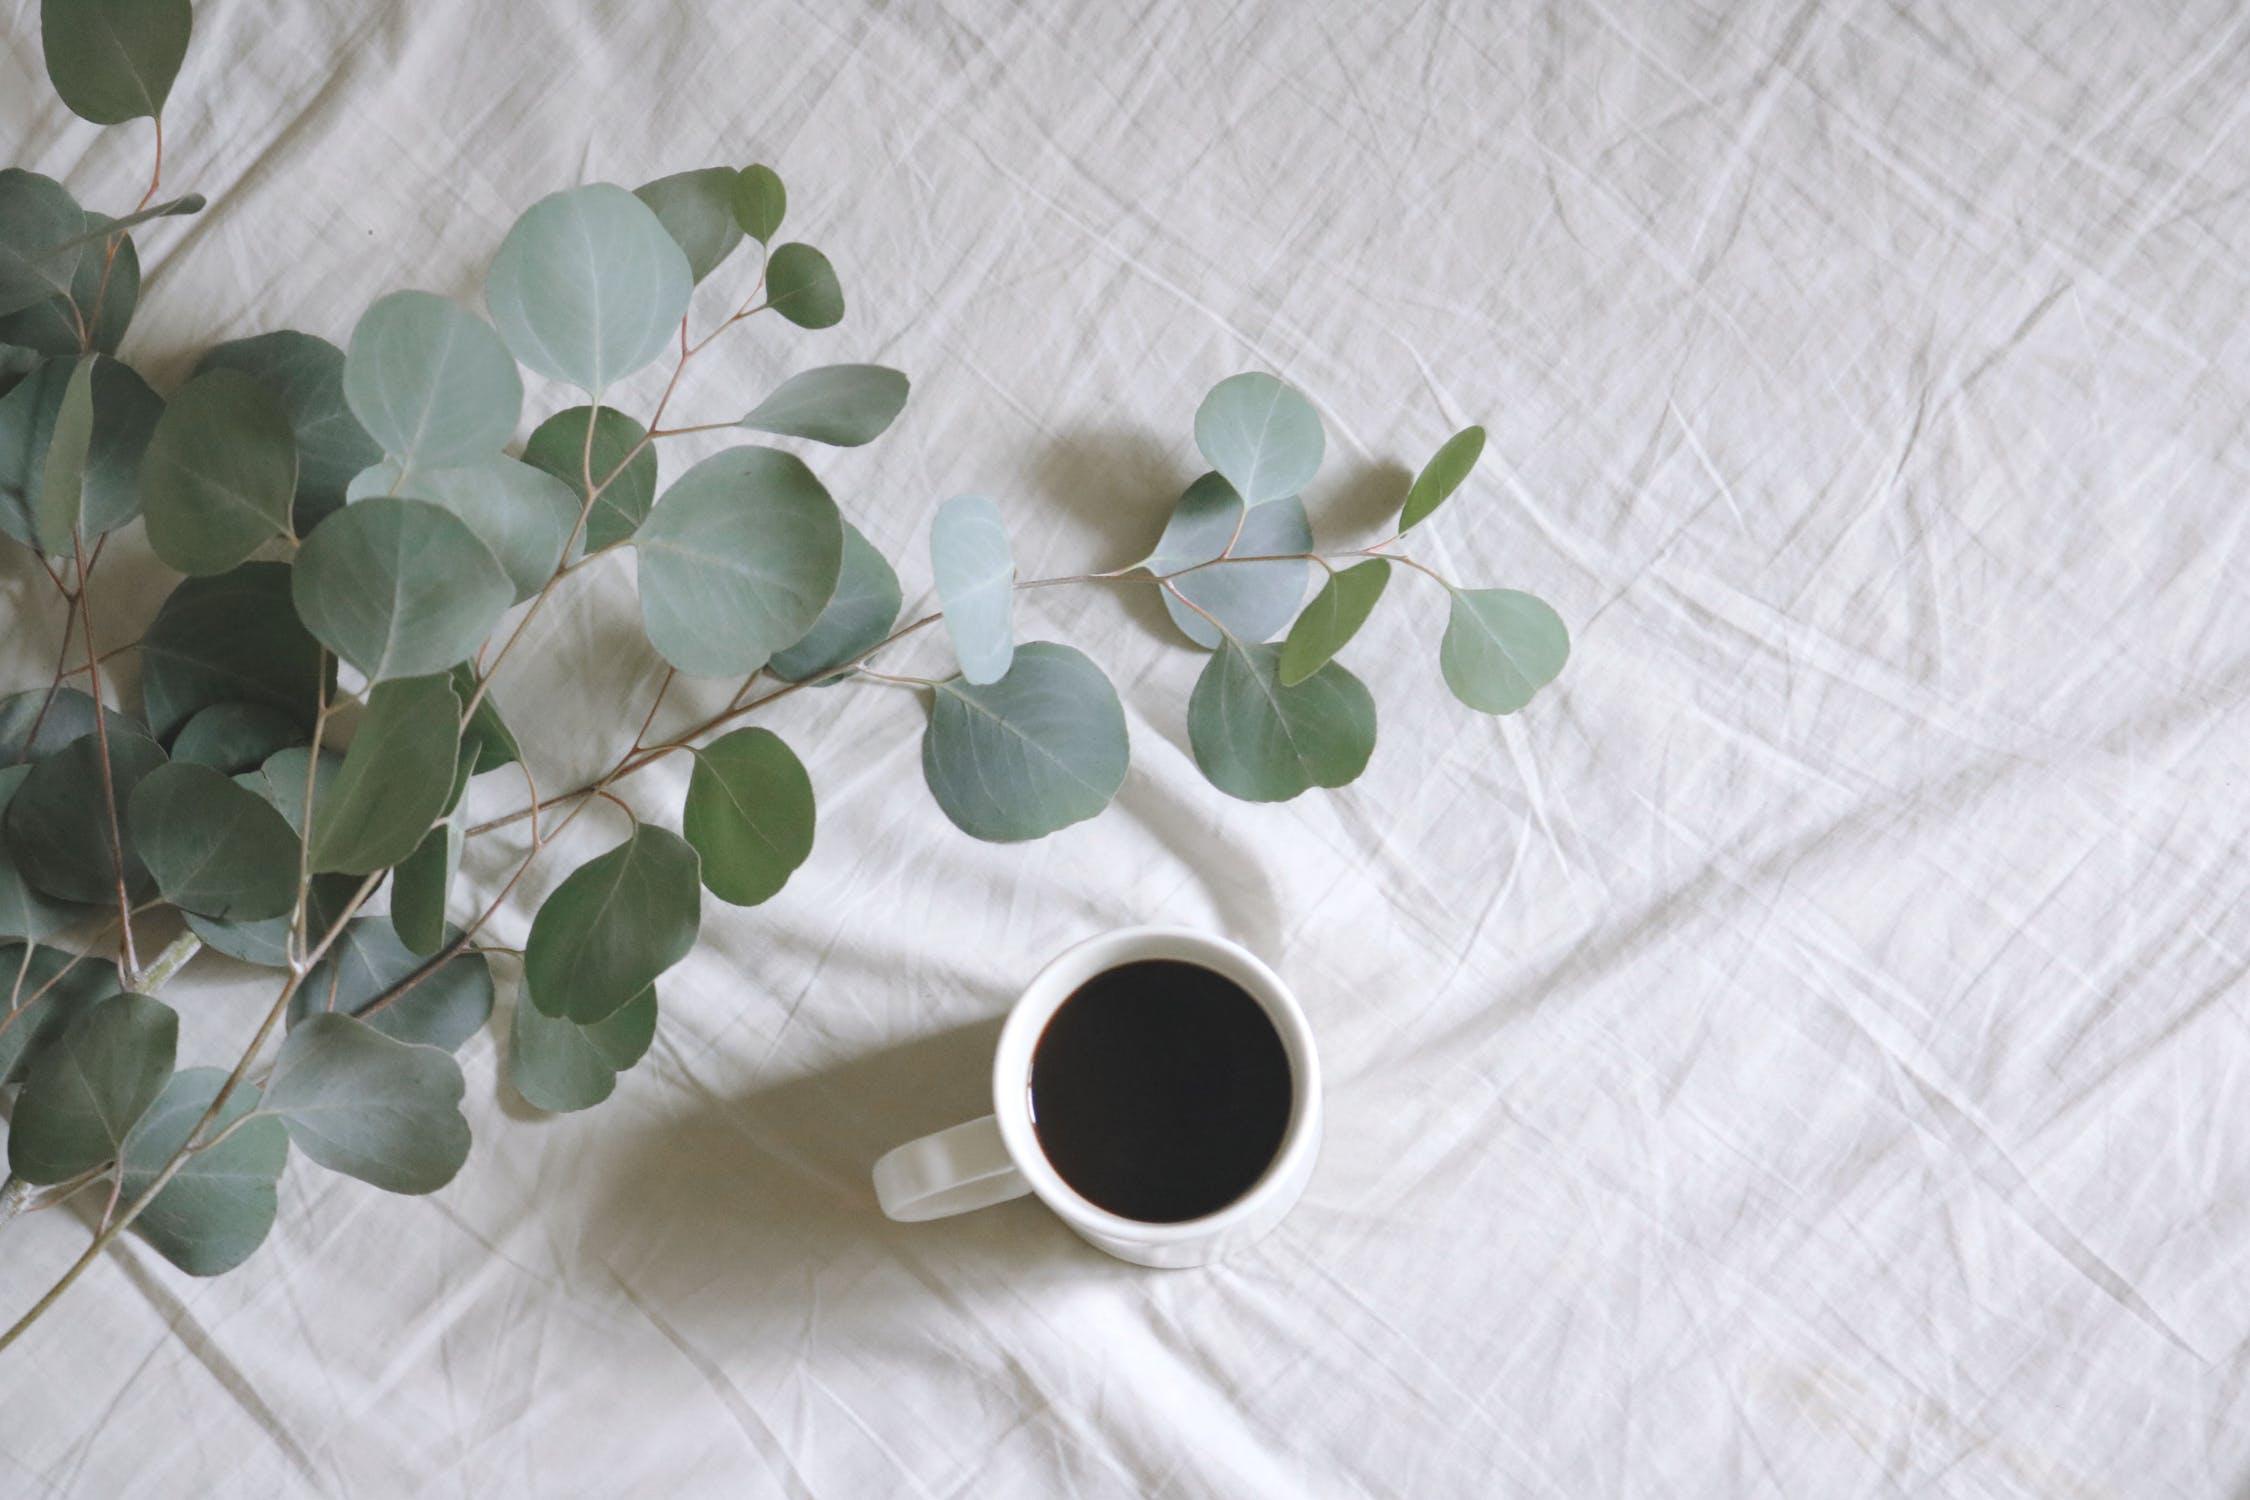 eucalyptus and coffee